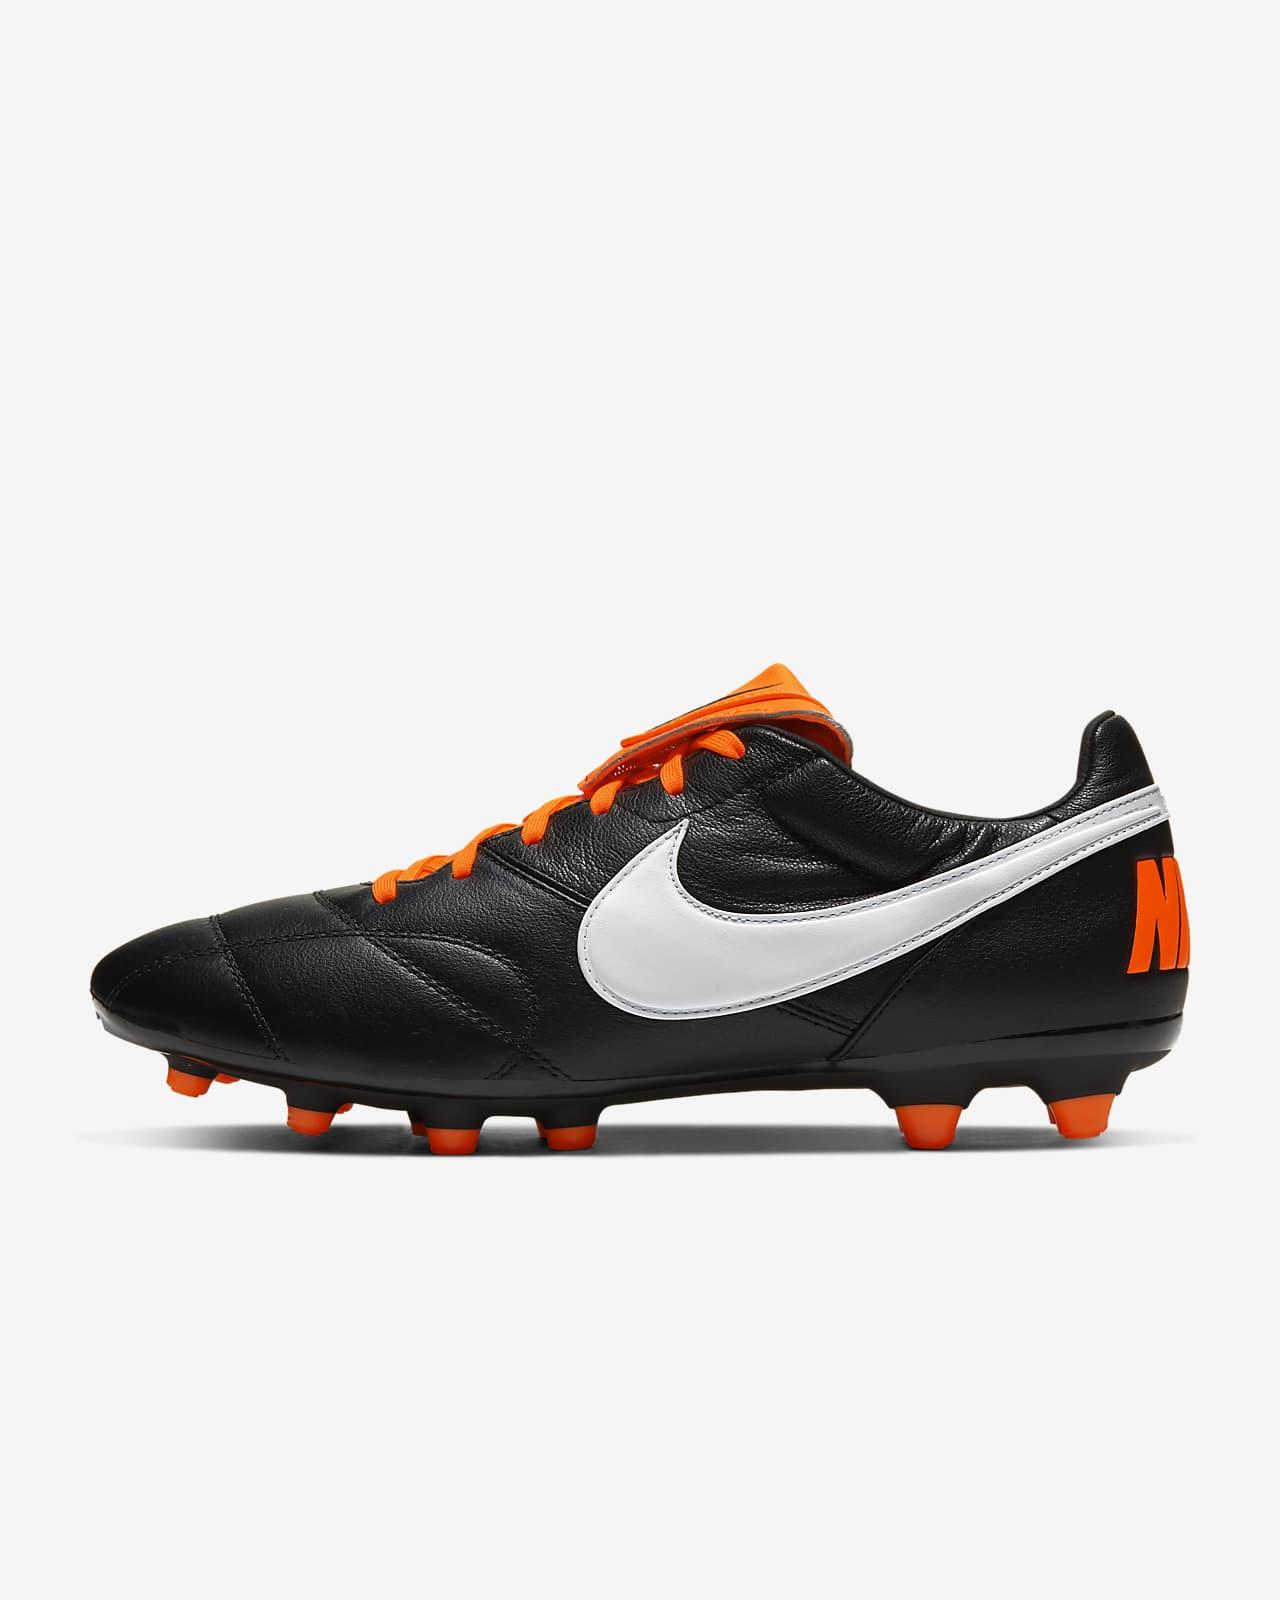 Lujo visto ropa silencio  Calzado de fútbol para terreno firme Nike Premier II FG. Nike.com